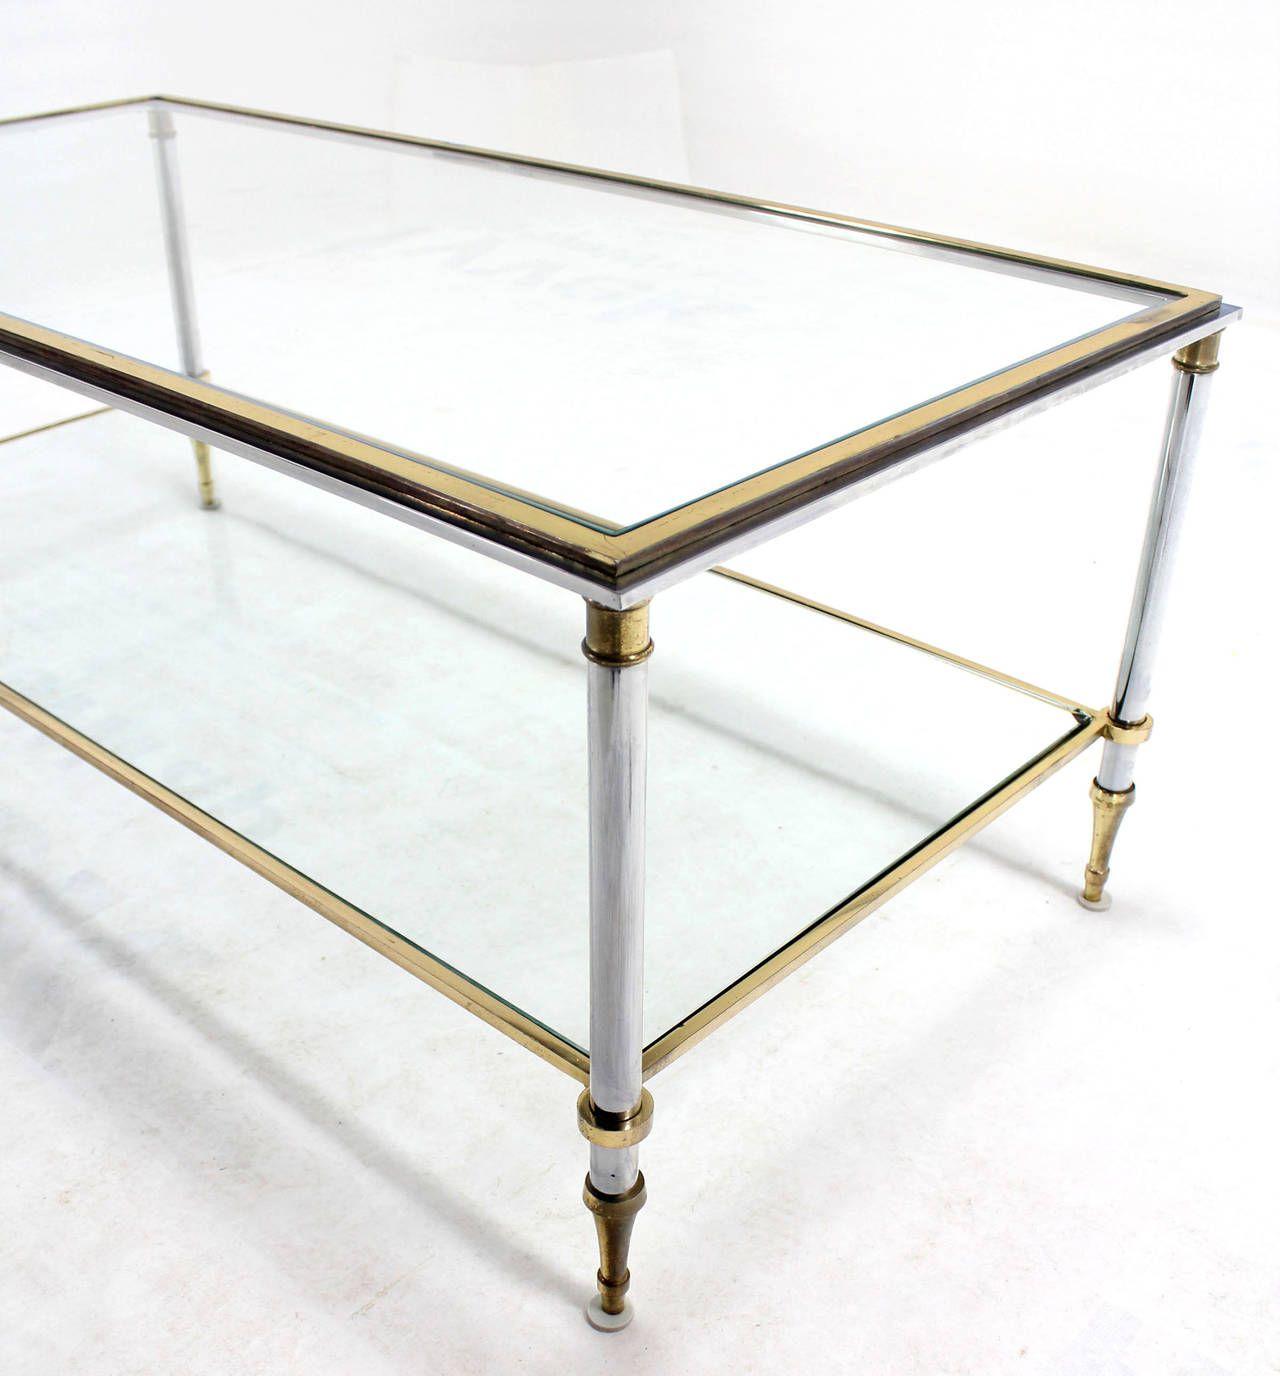 Brass Chrome And Glass Top Mid Century Modern Rectangular Coffee Table 1stdibs Com Rectangular Coffee Table Coffee Tables For Sale Coffee Table Images [ 1376 x 1280 Pixel ]